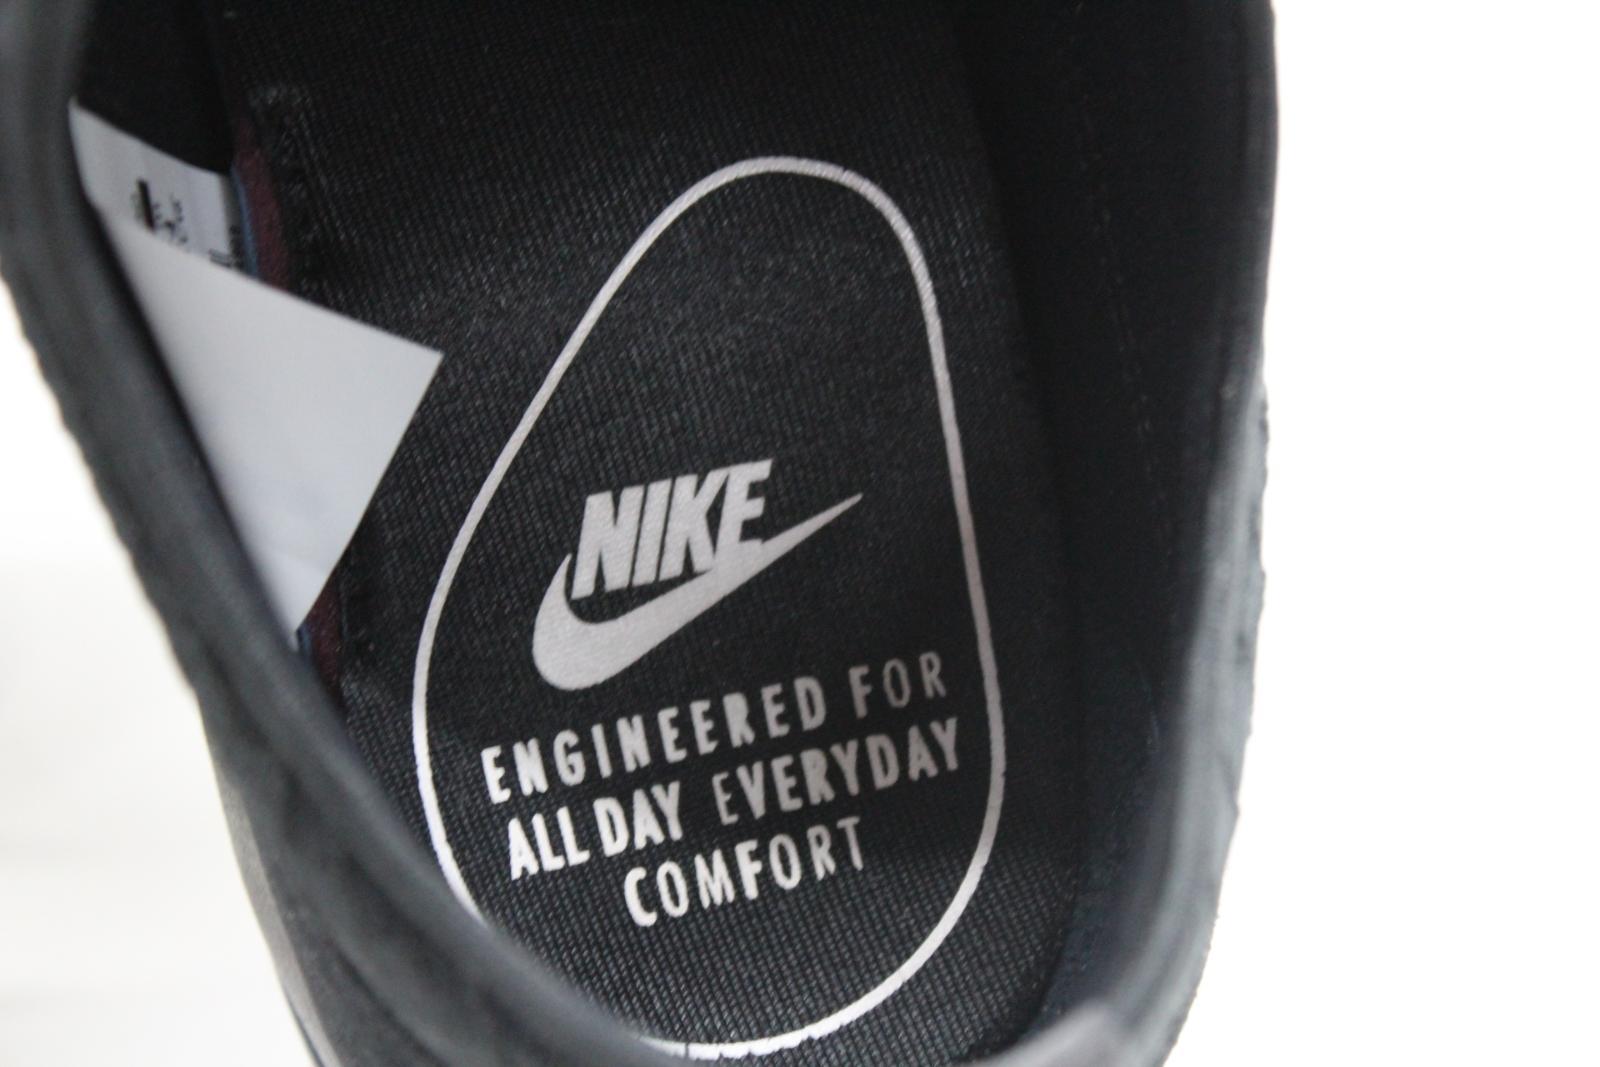 Nike-Air-Max-Thea-Ultra-Femmes-Baskets-noir-sportswear-Taille-UK4-5-EU38 miniature 10